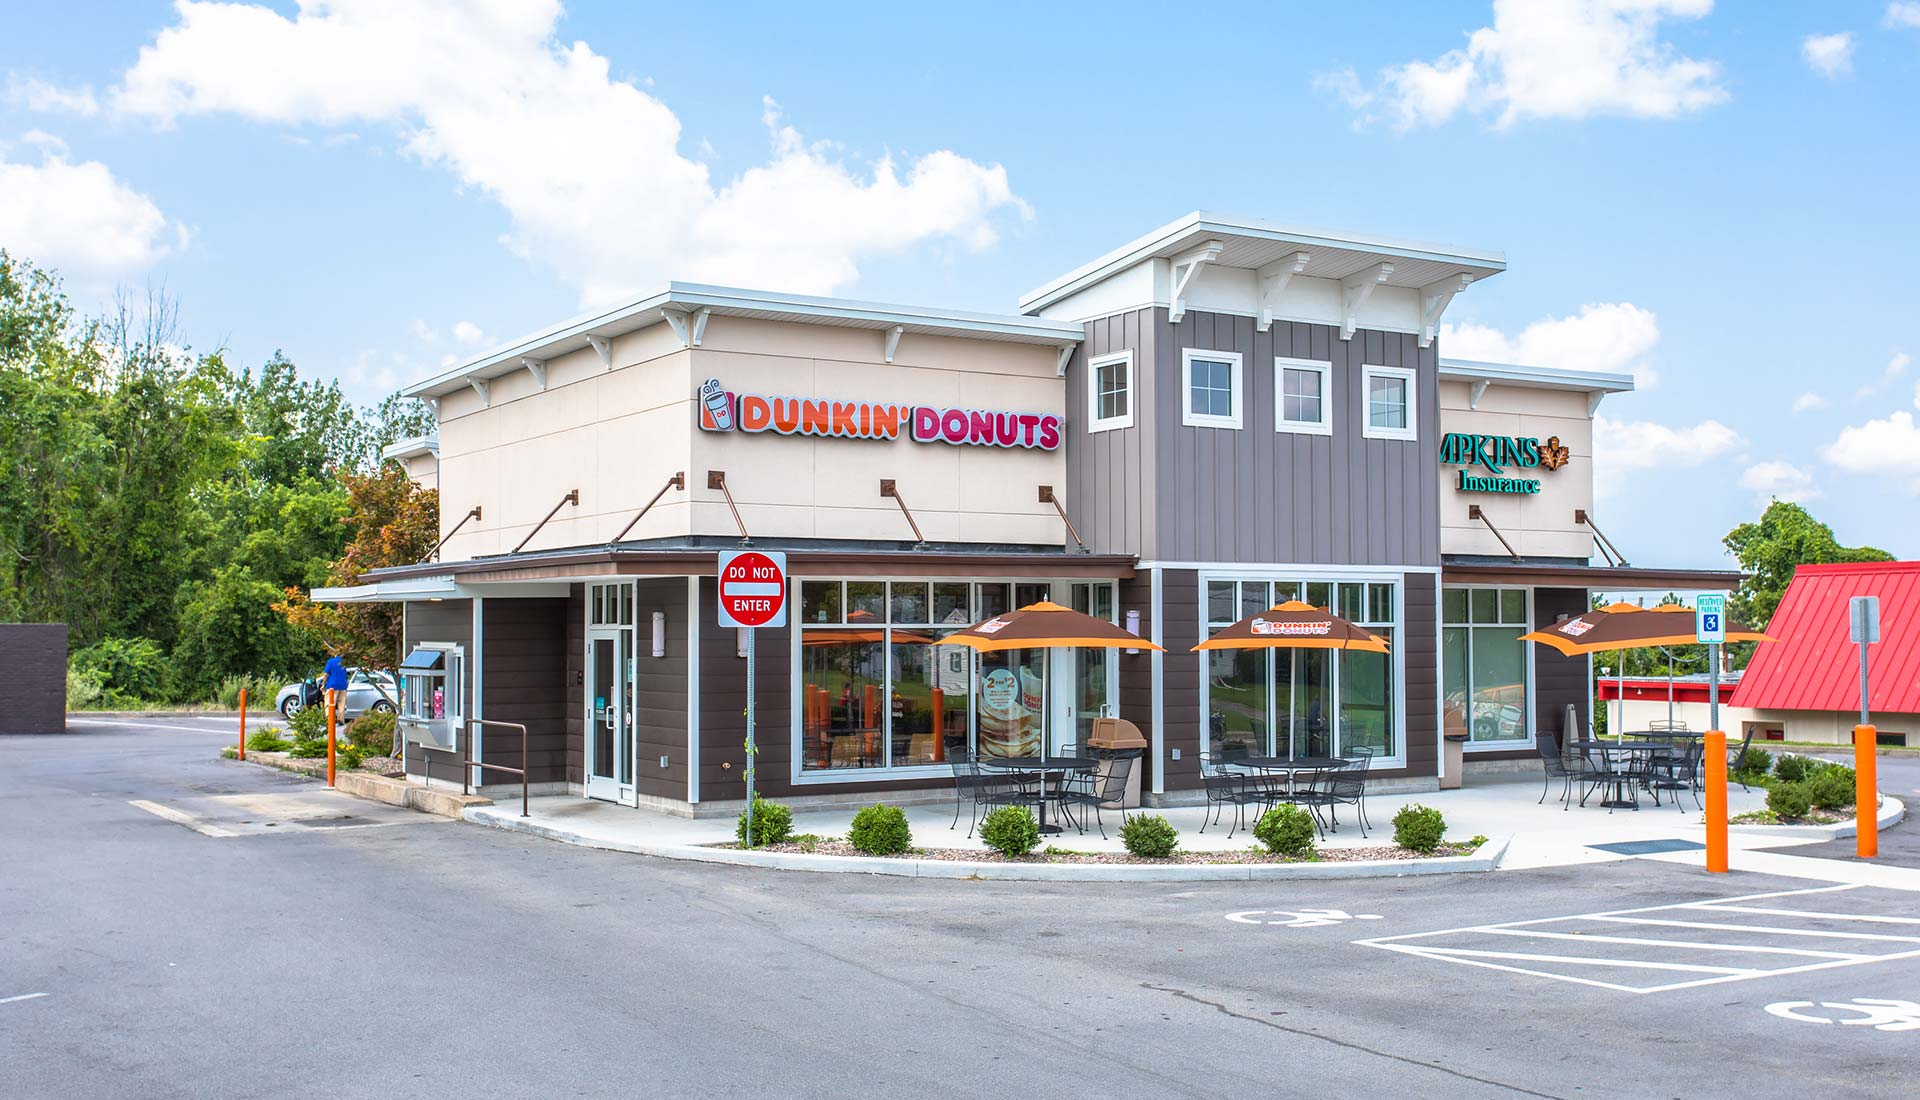 Dunkin Donuts - Brockport